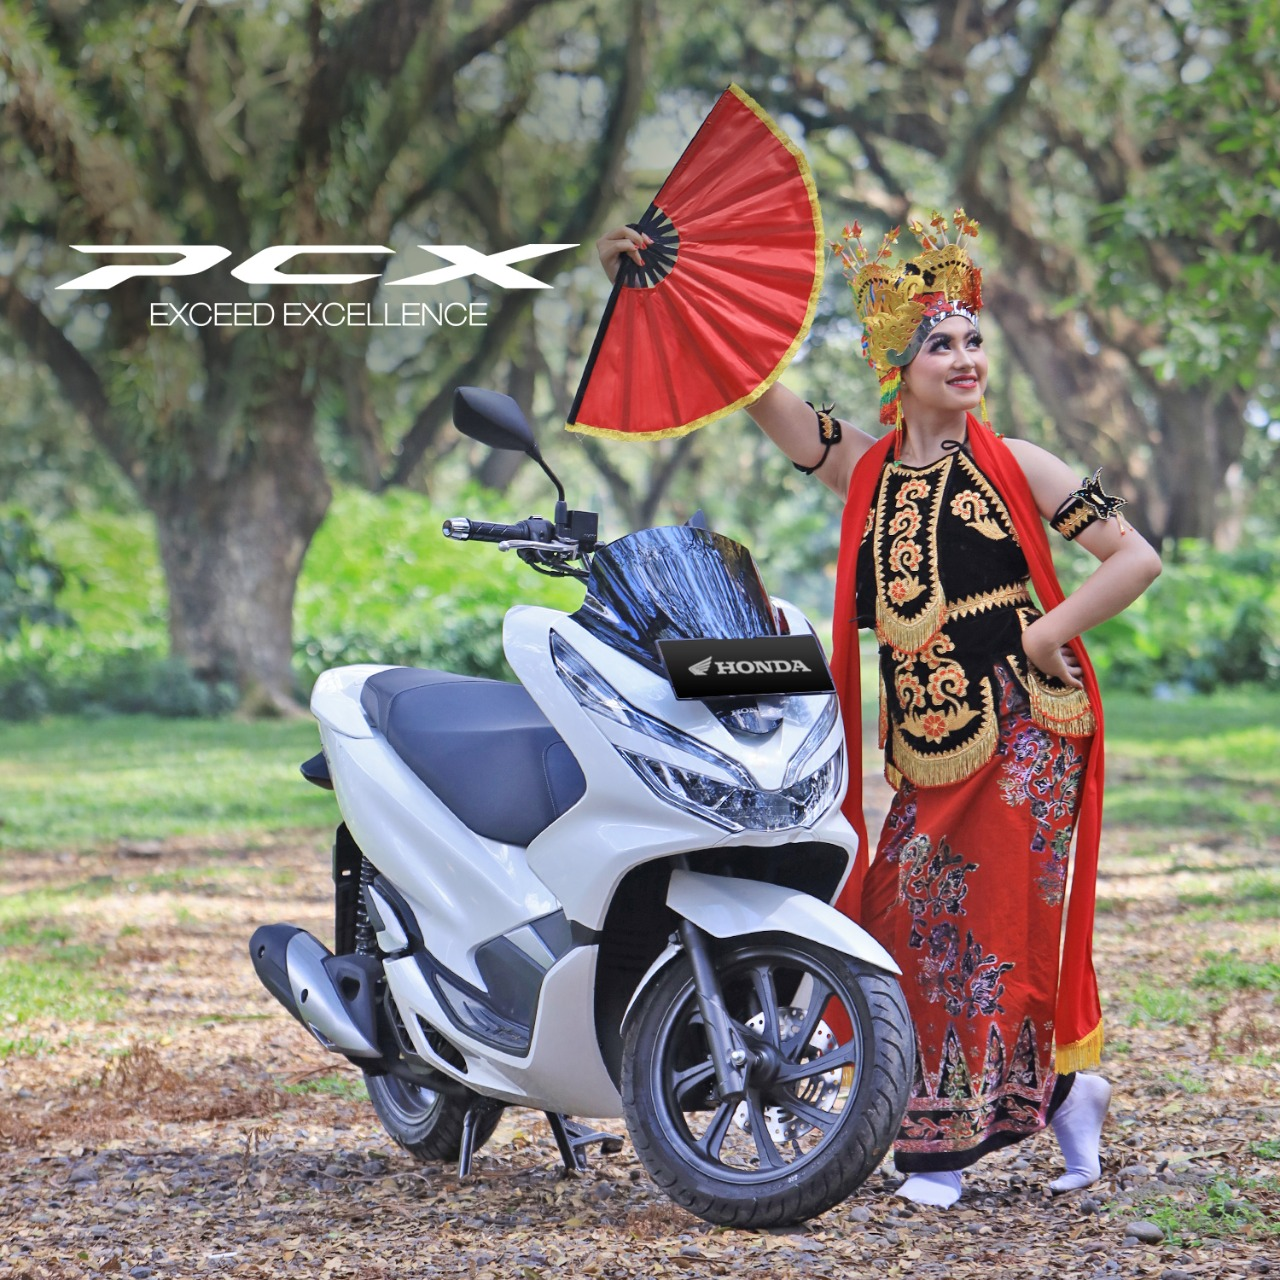 Berikan Potongan Angsuran Dan Hadiah Accesories Untuk Pembelian Motor Honda PCX 150, Motornya Lare Osing